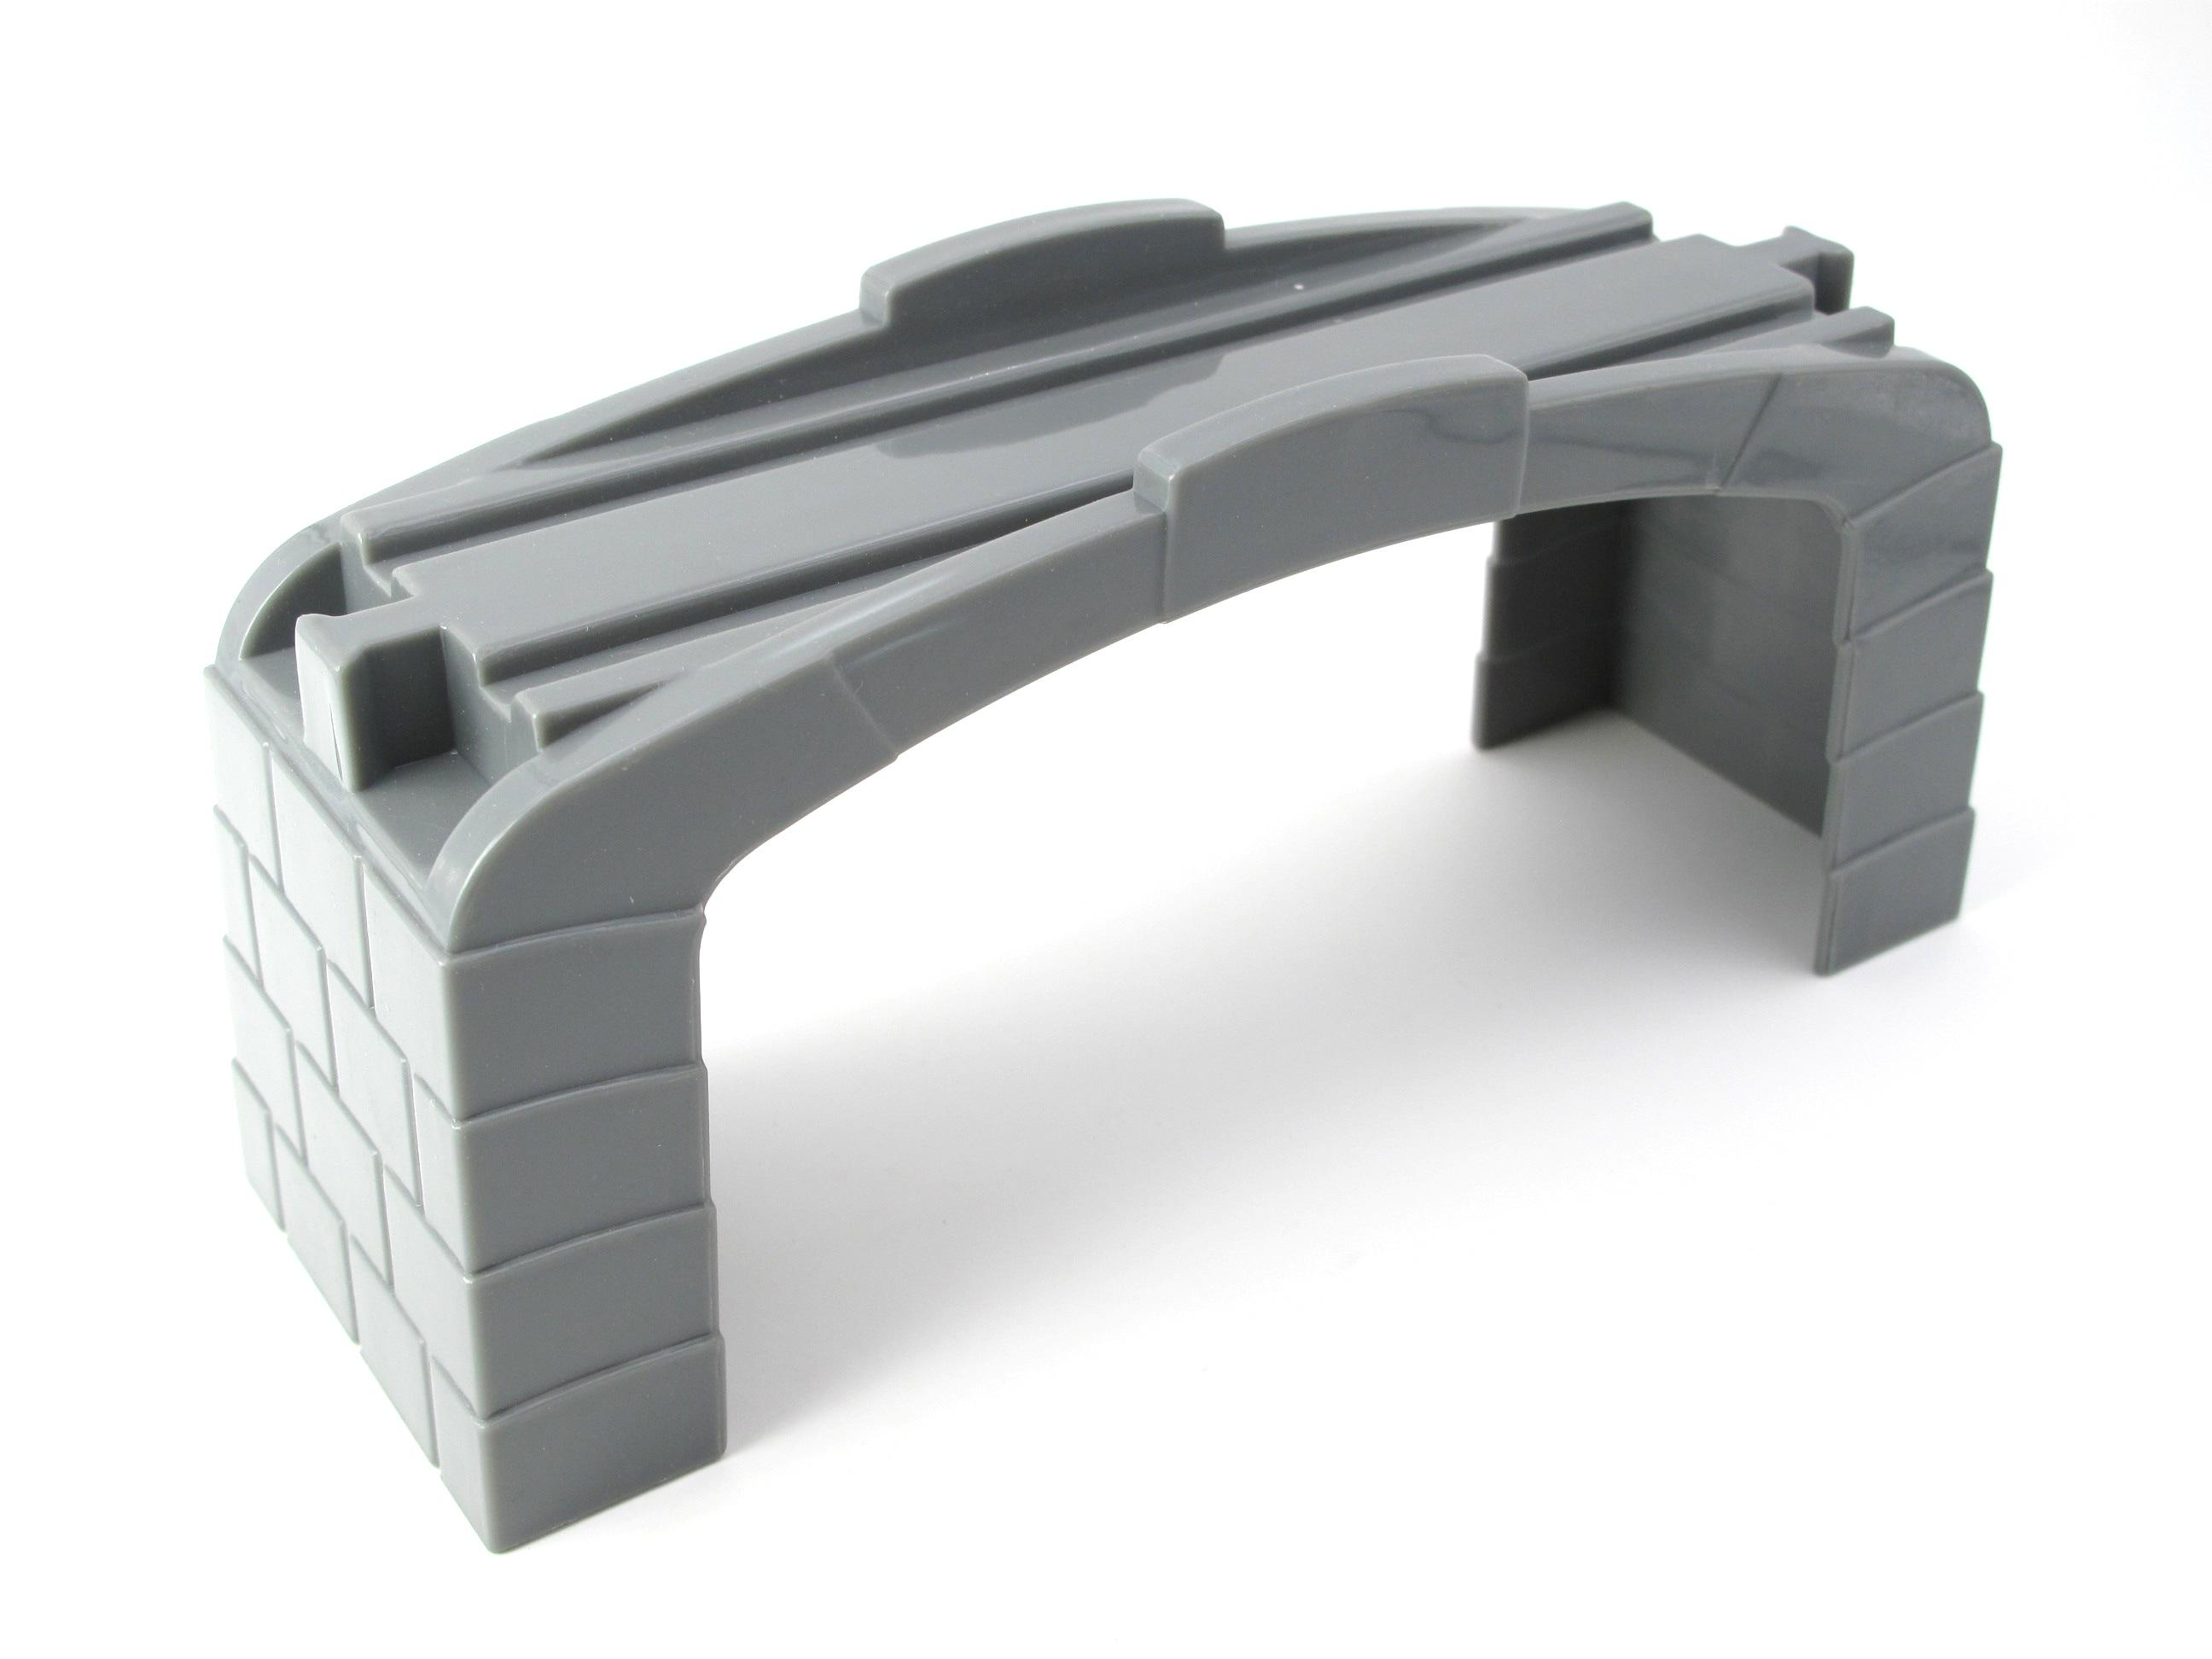 Train Toys Railway Track TTC115 Grey Pier Fit For  Car Brio Toys For Boys Engine Models Building Toy